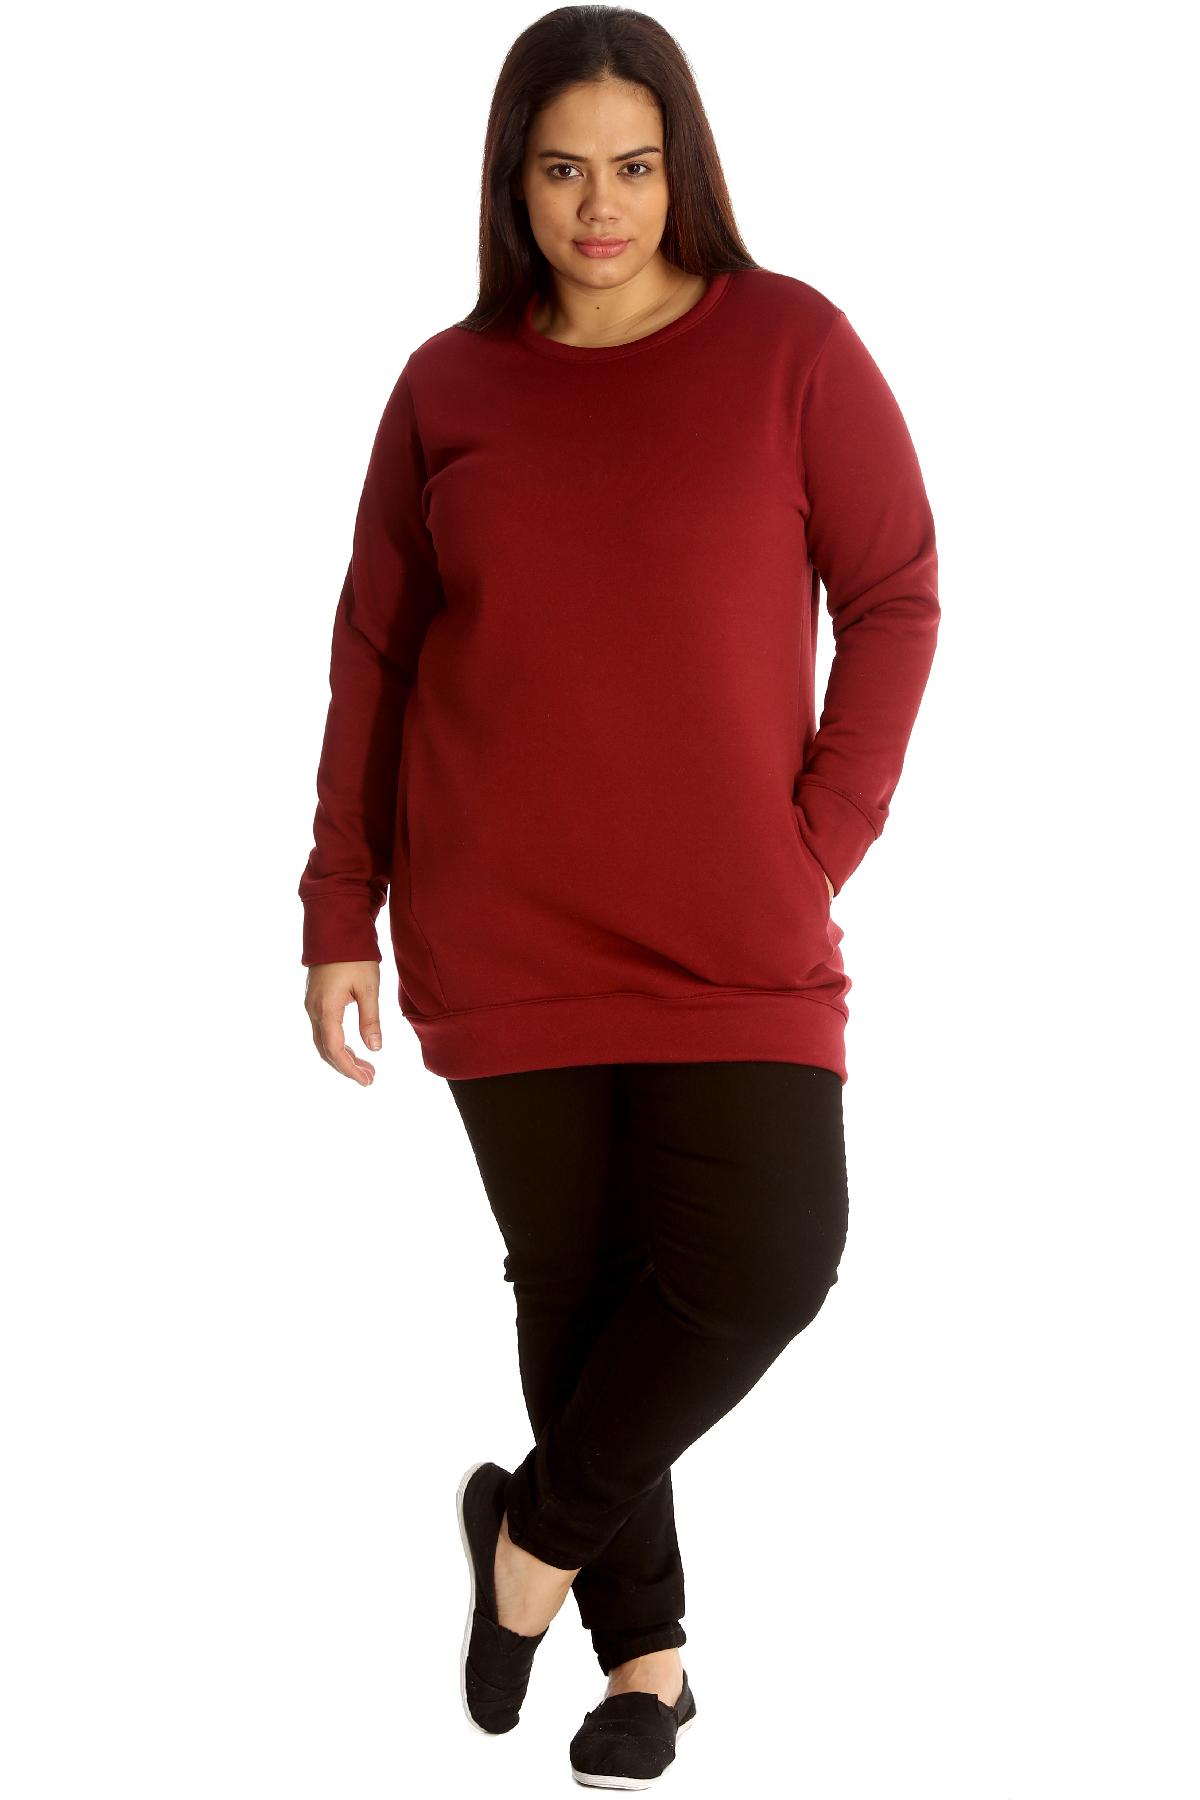 New Womens Plus Size Sweatshirt Ladies Long Cardigan Style Warm ...